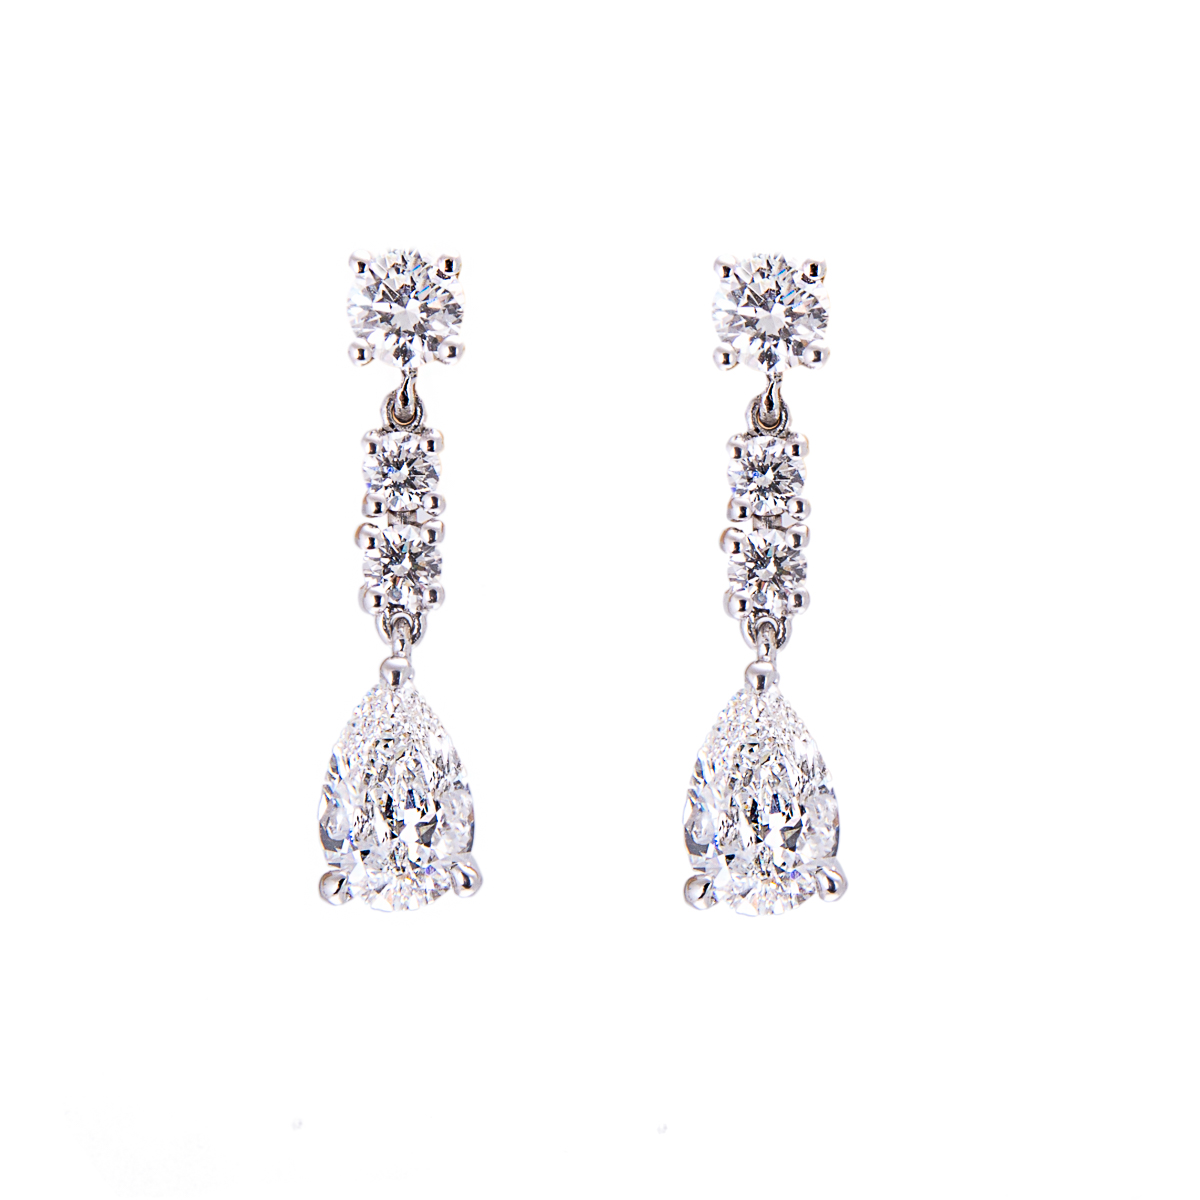 18ct-white-gold-diamond-drop-earrings-hancocks-manchester